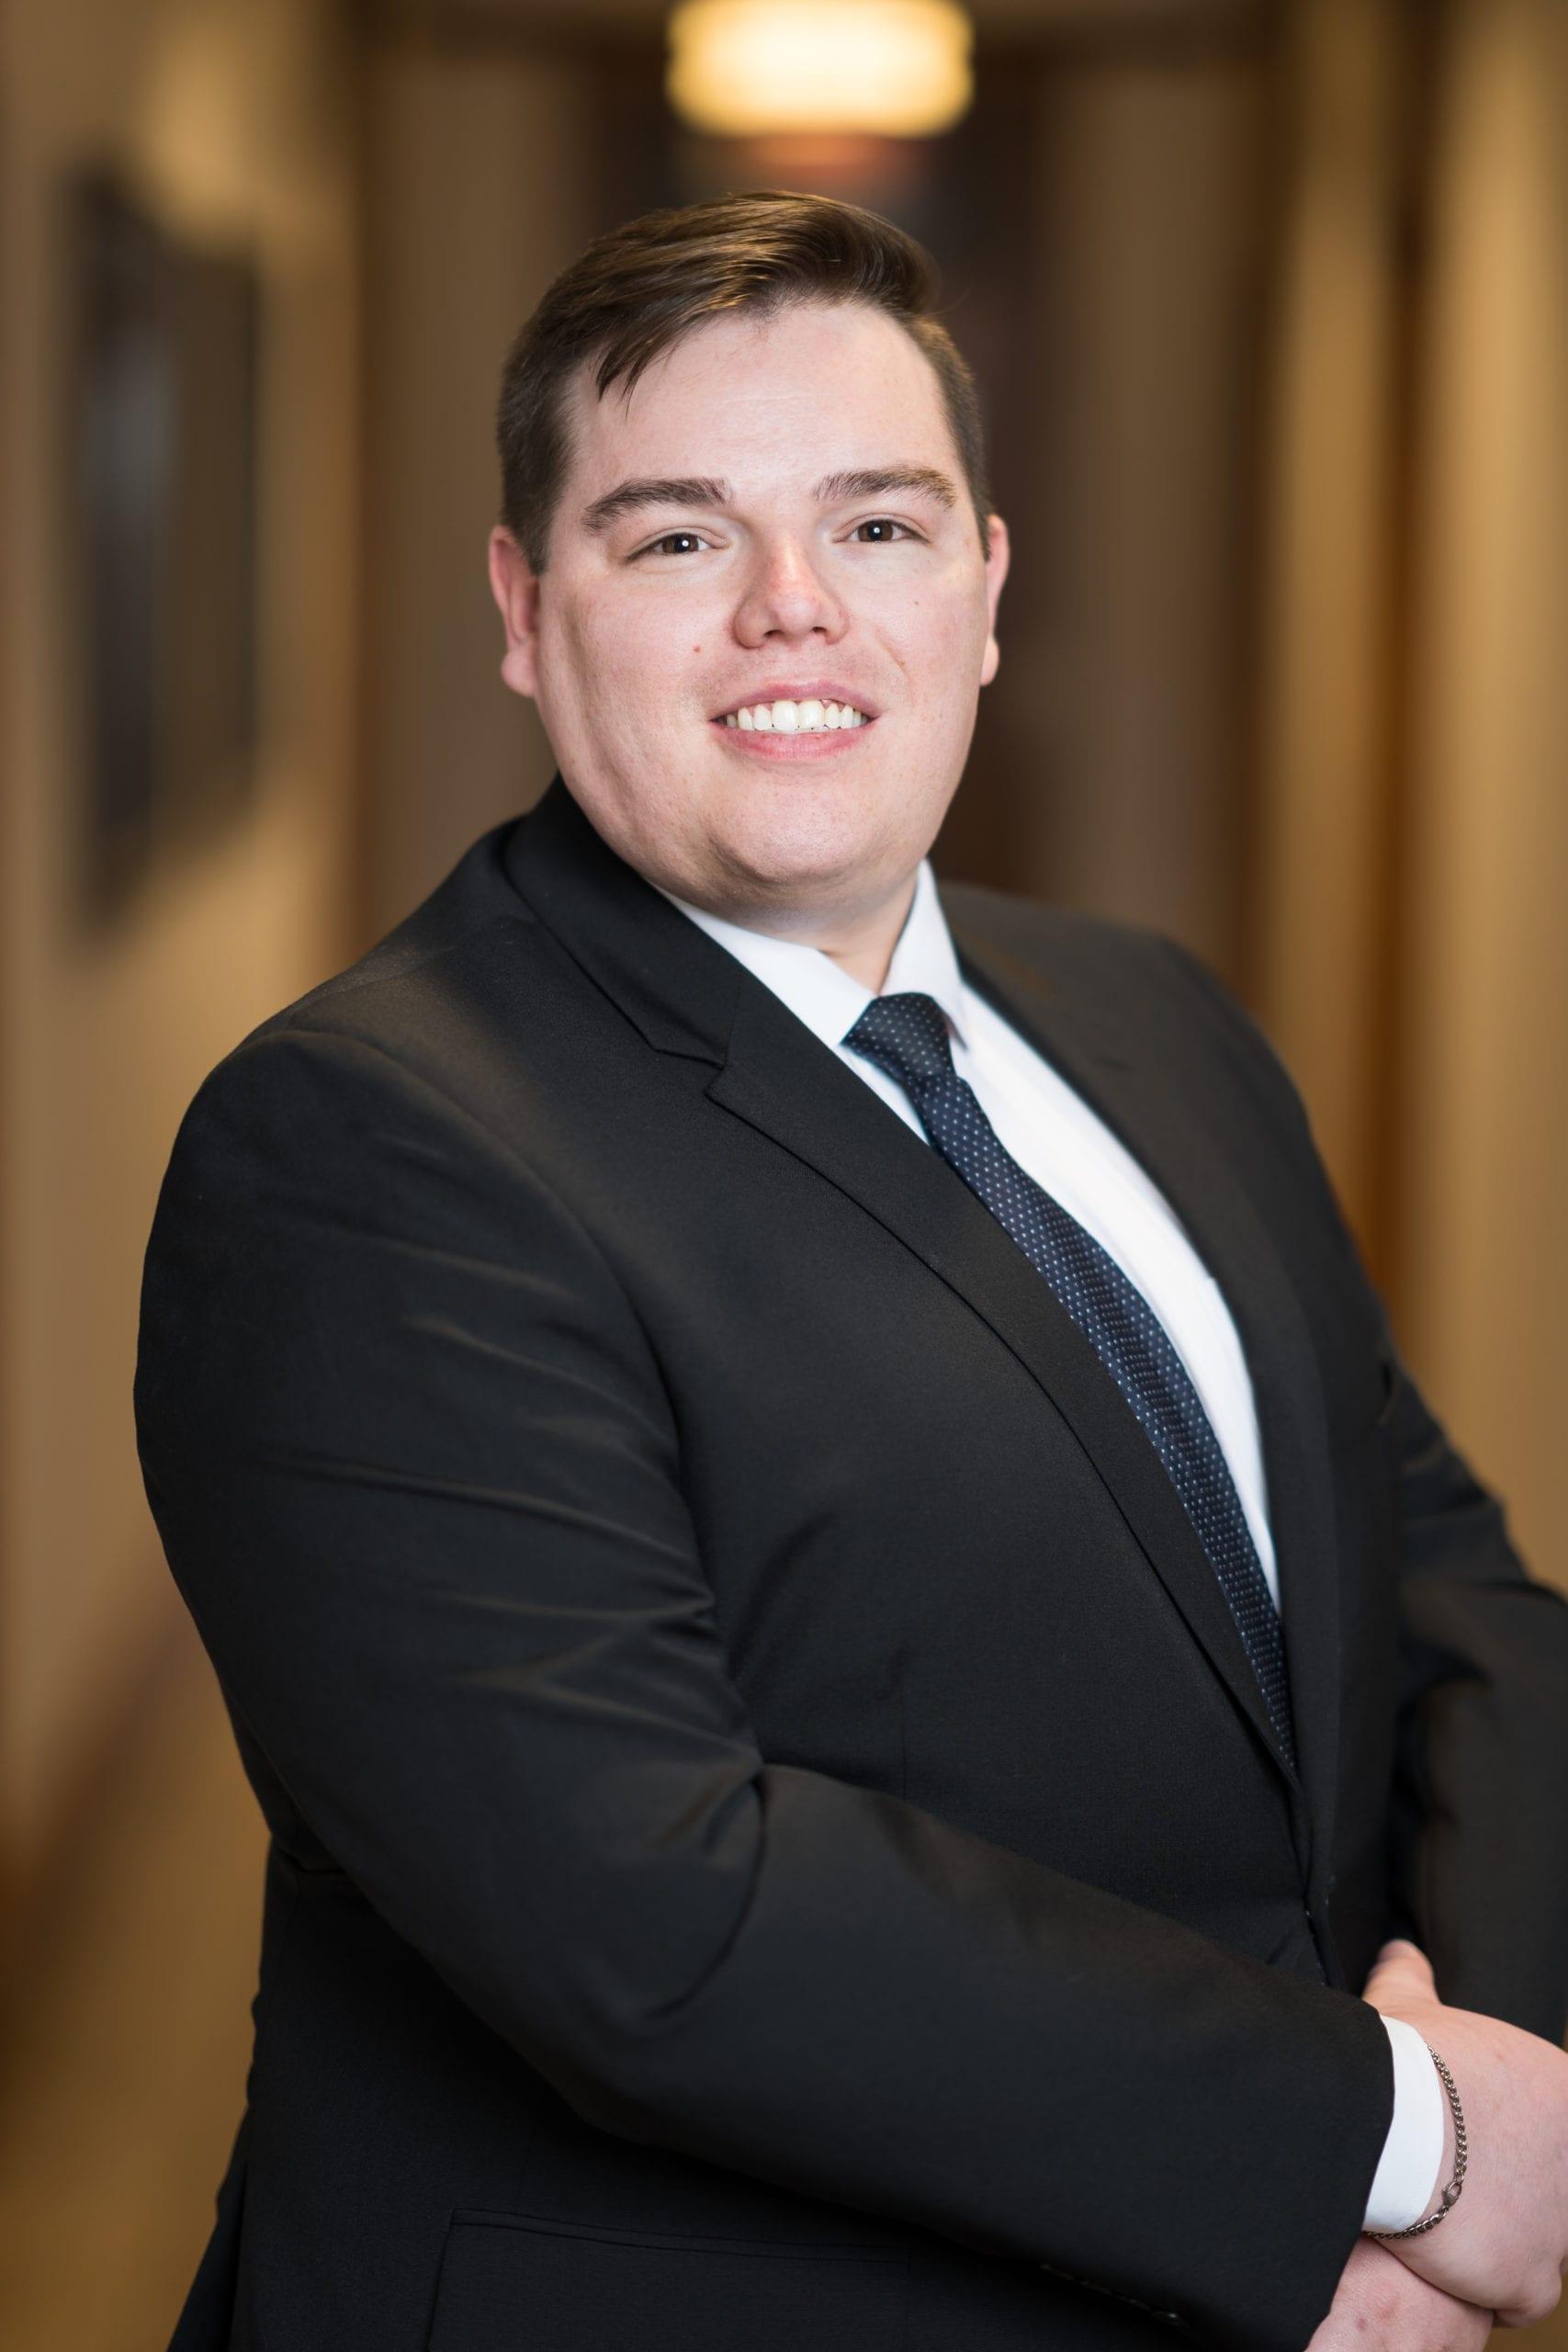 Matt Morris, Associate Personal Injury Attorney in Tyler Texas